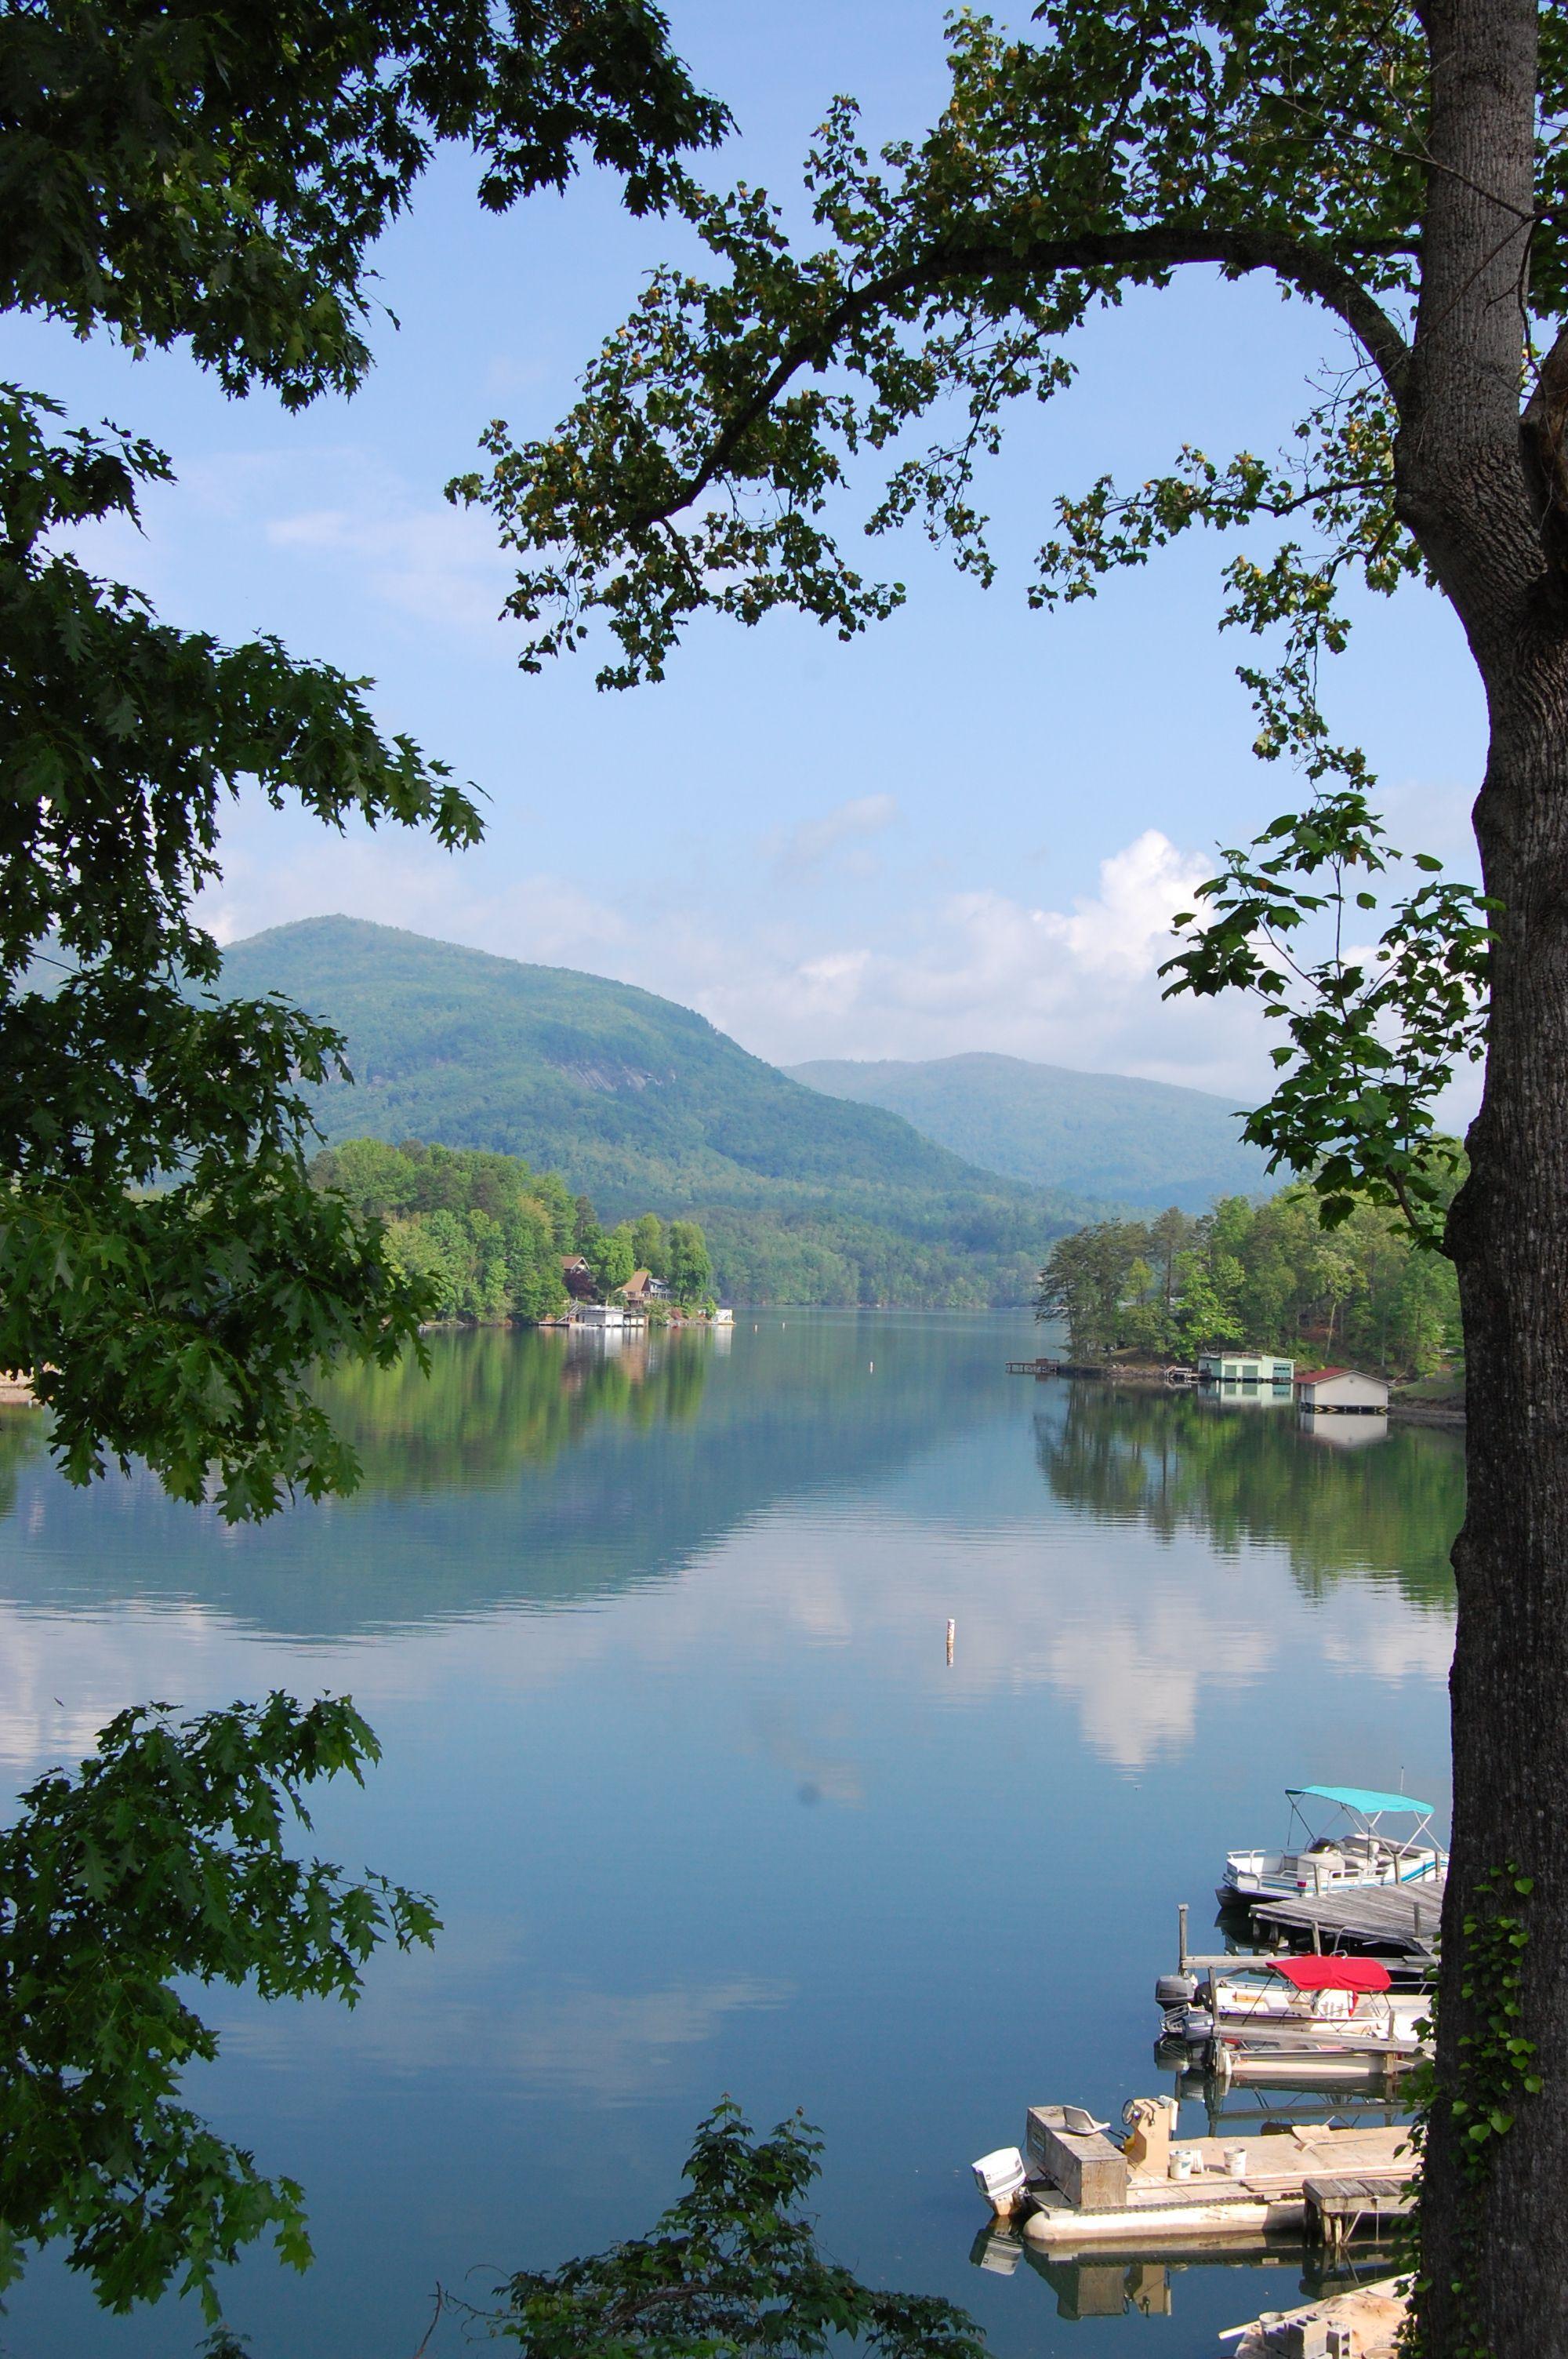 Pin By Becki S Heiniger On Inspirations For Me North Carolina Mountains Lake Lure North Carolina Homes